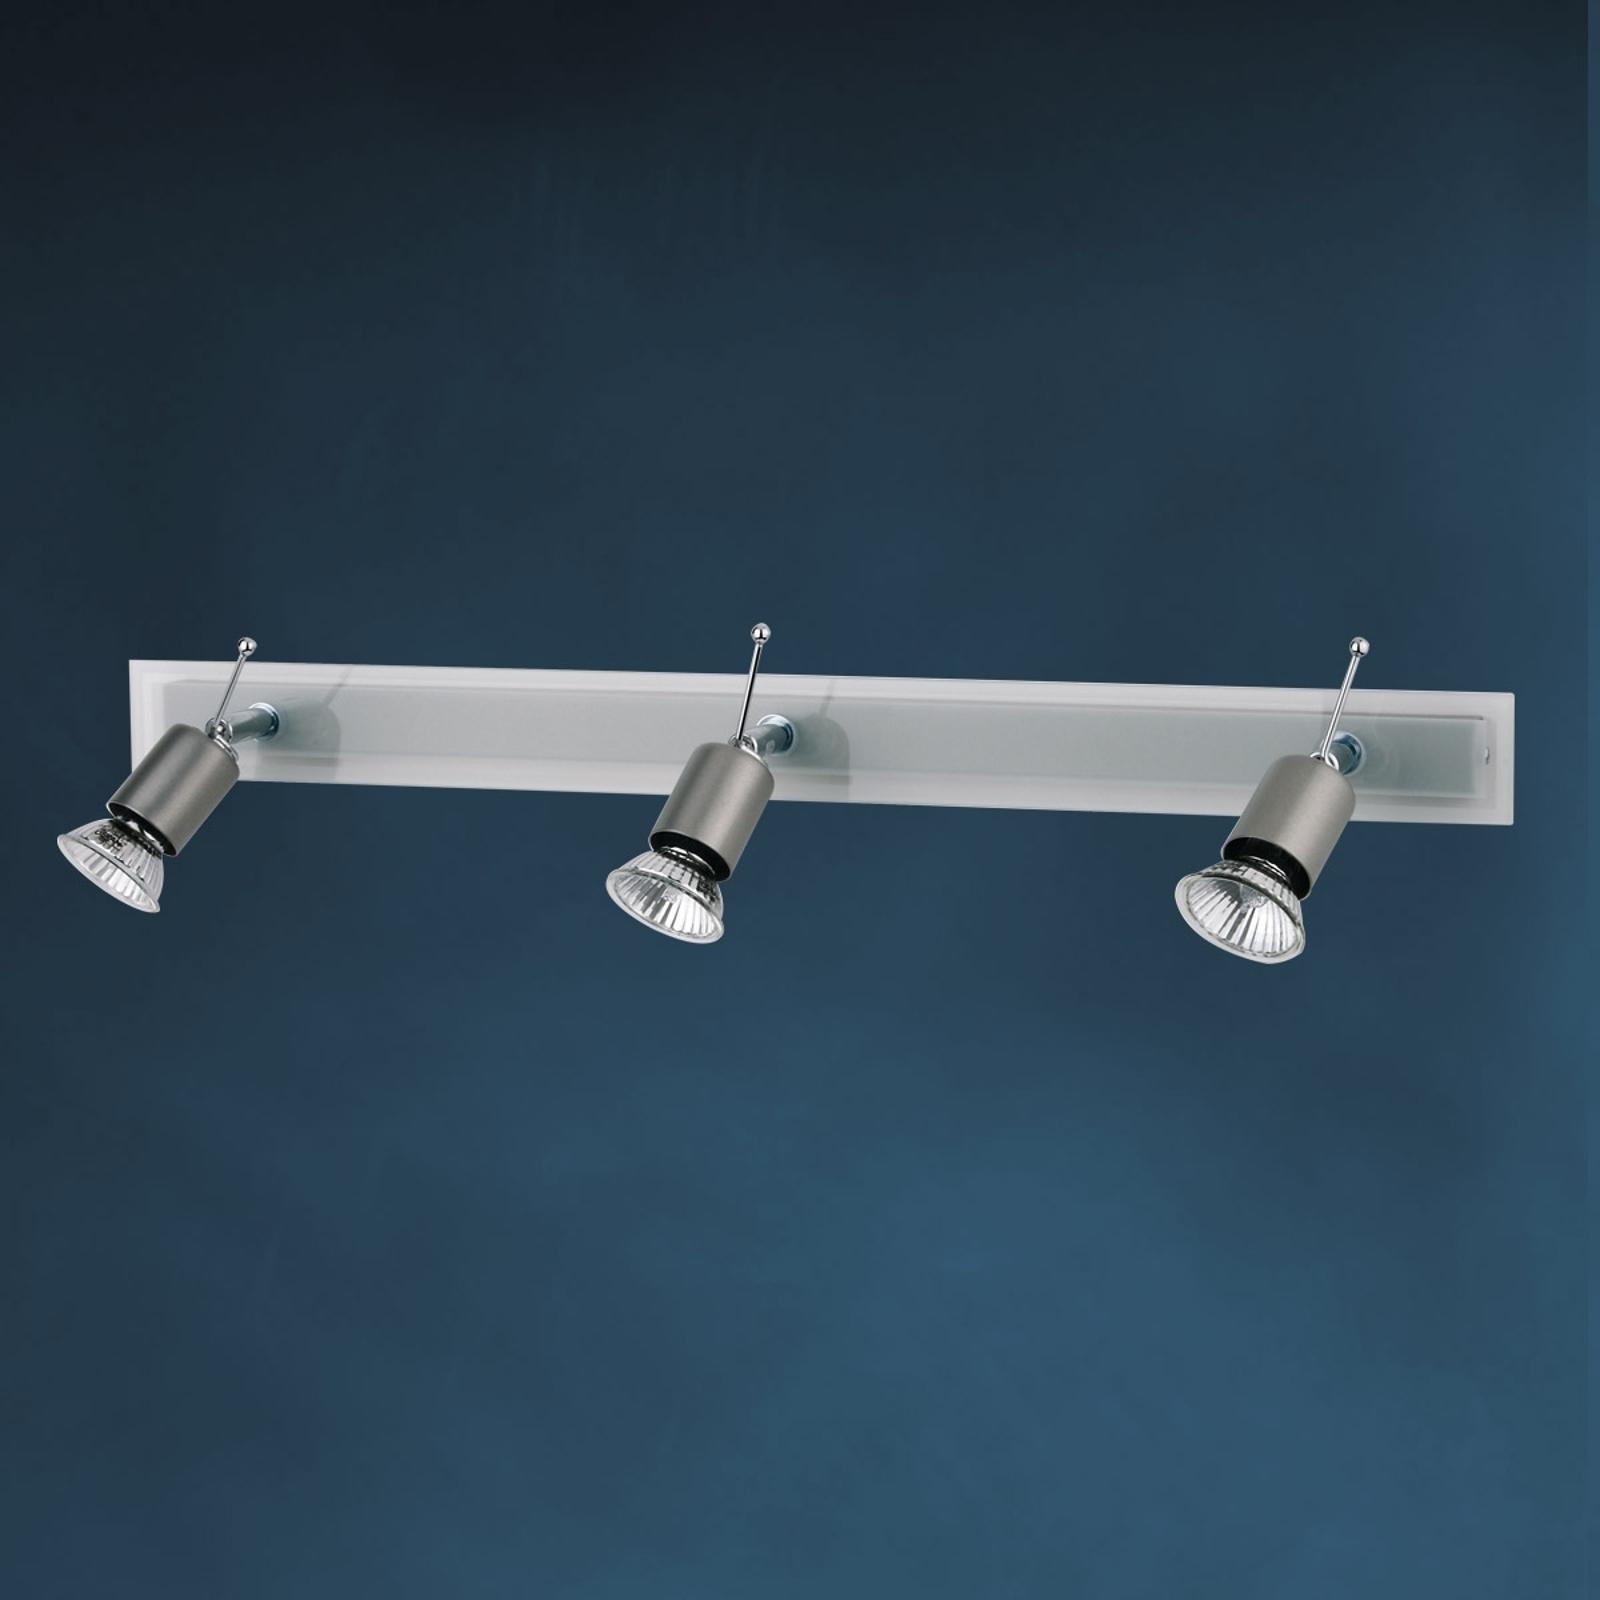 Glazed wall spotlight SARA, three-bulb_1524066_1